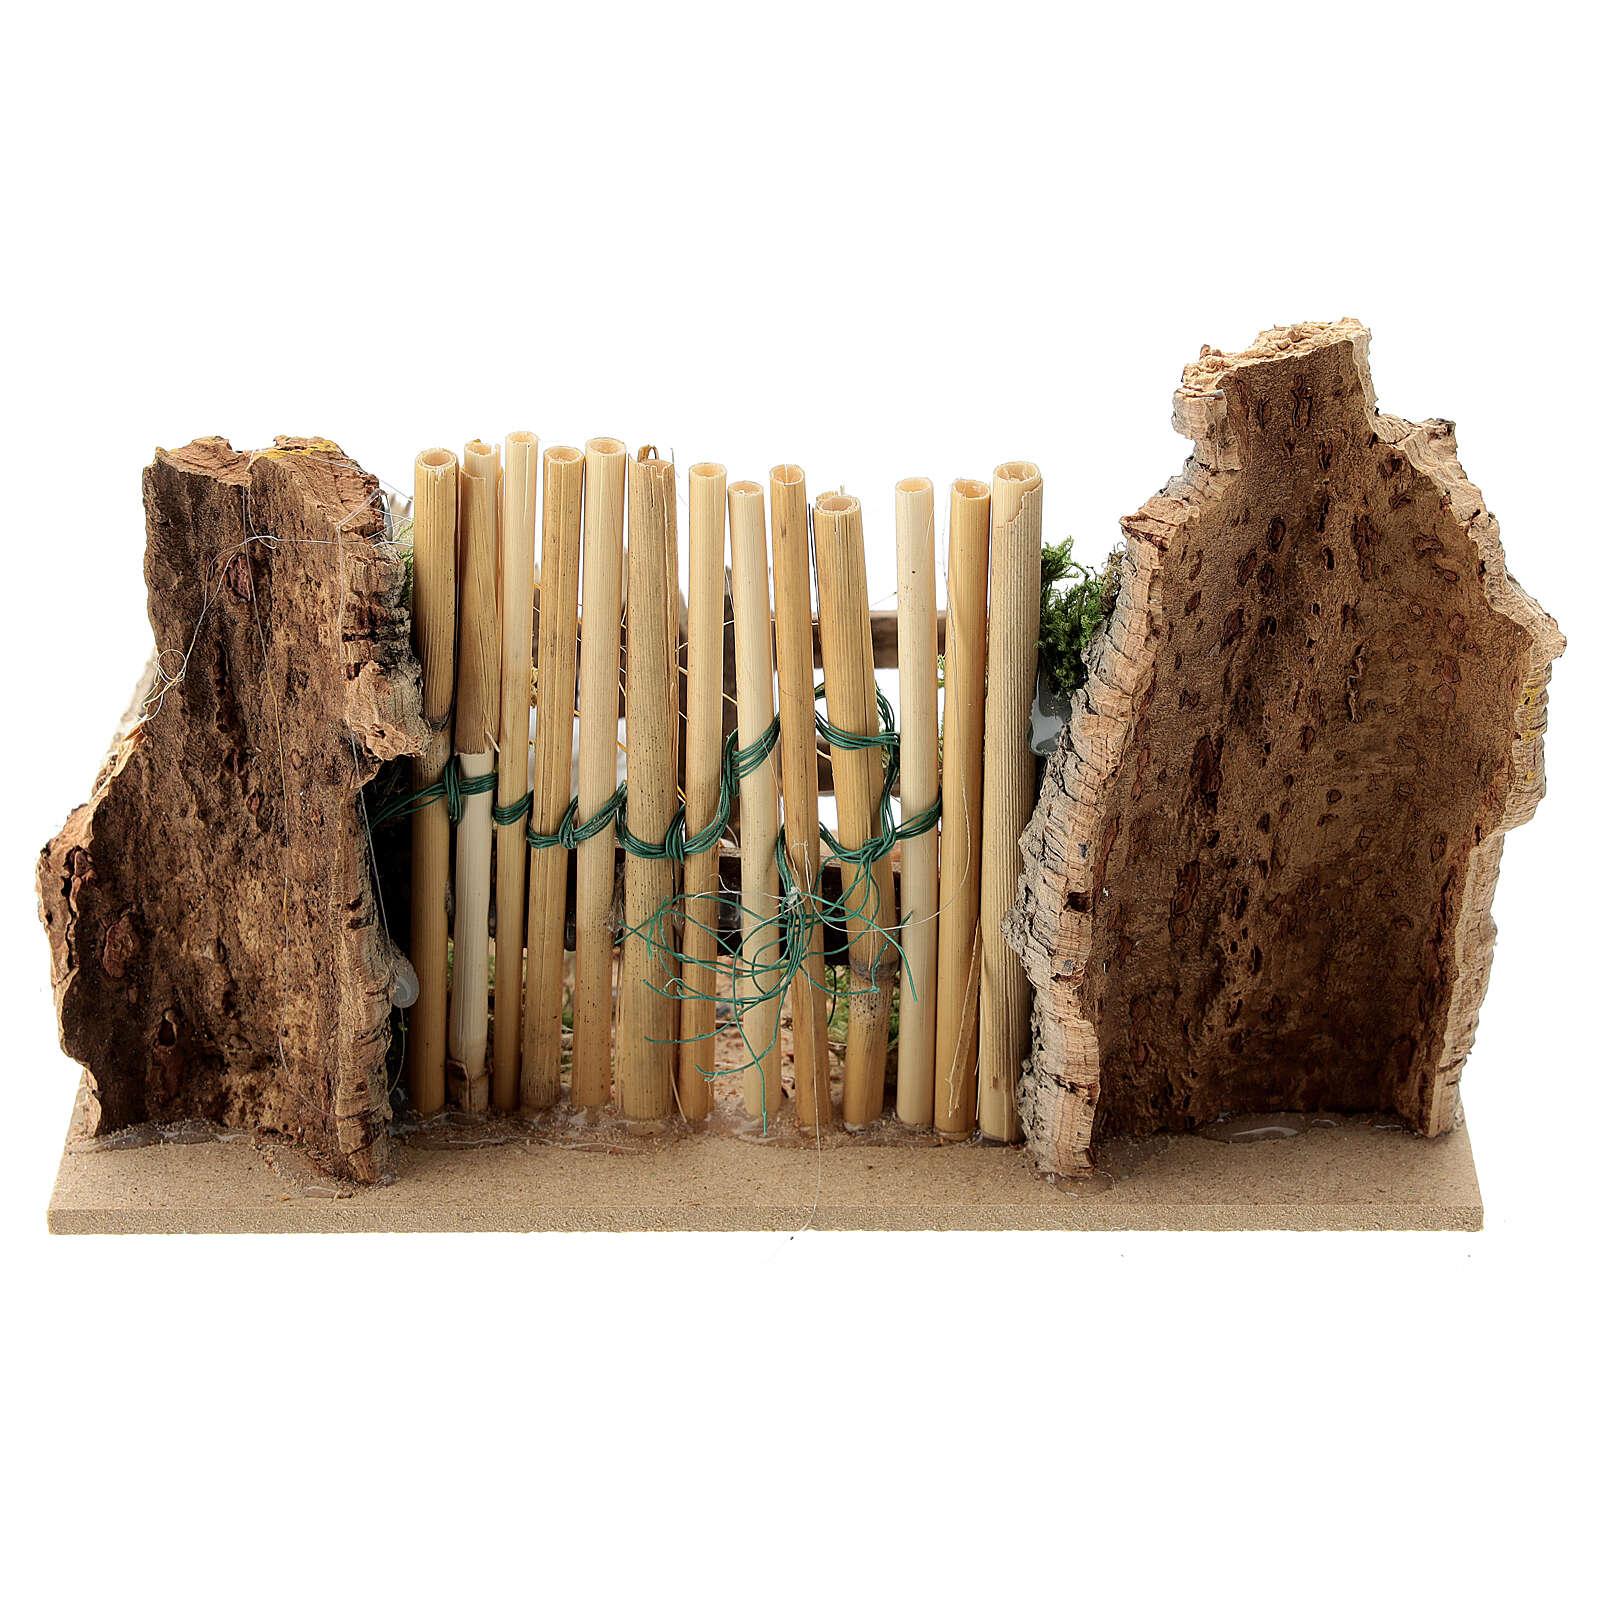 Sheep enclosure wood cork gate 10x15x10 cm, nativity set 8 cm 4